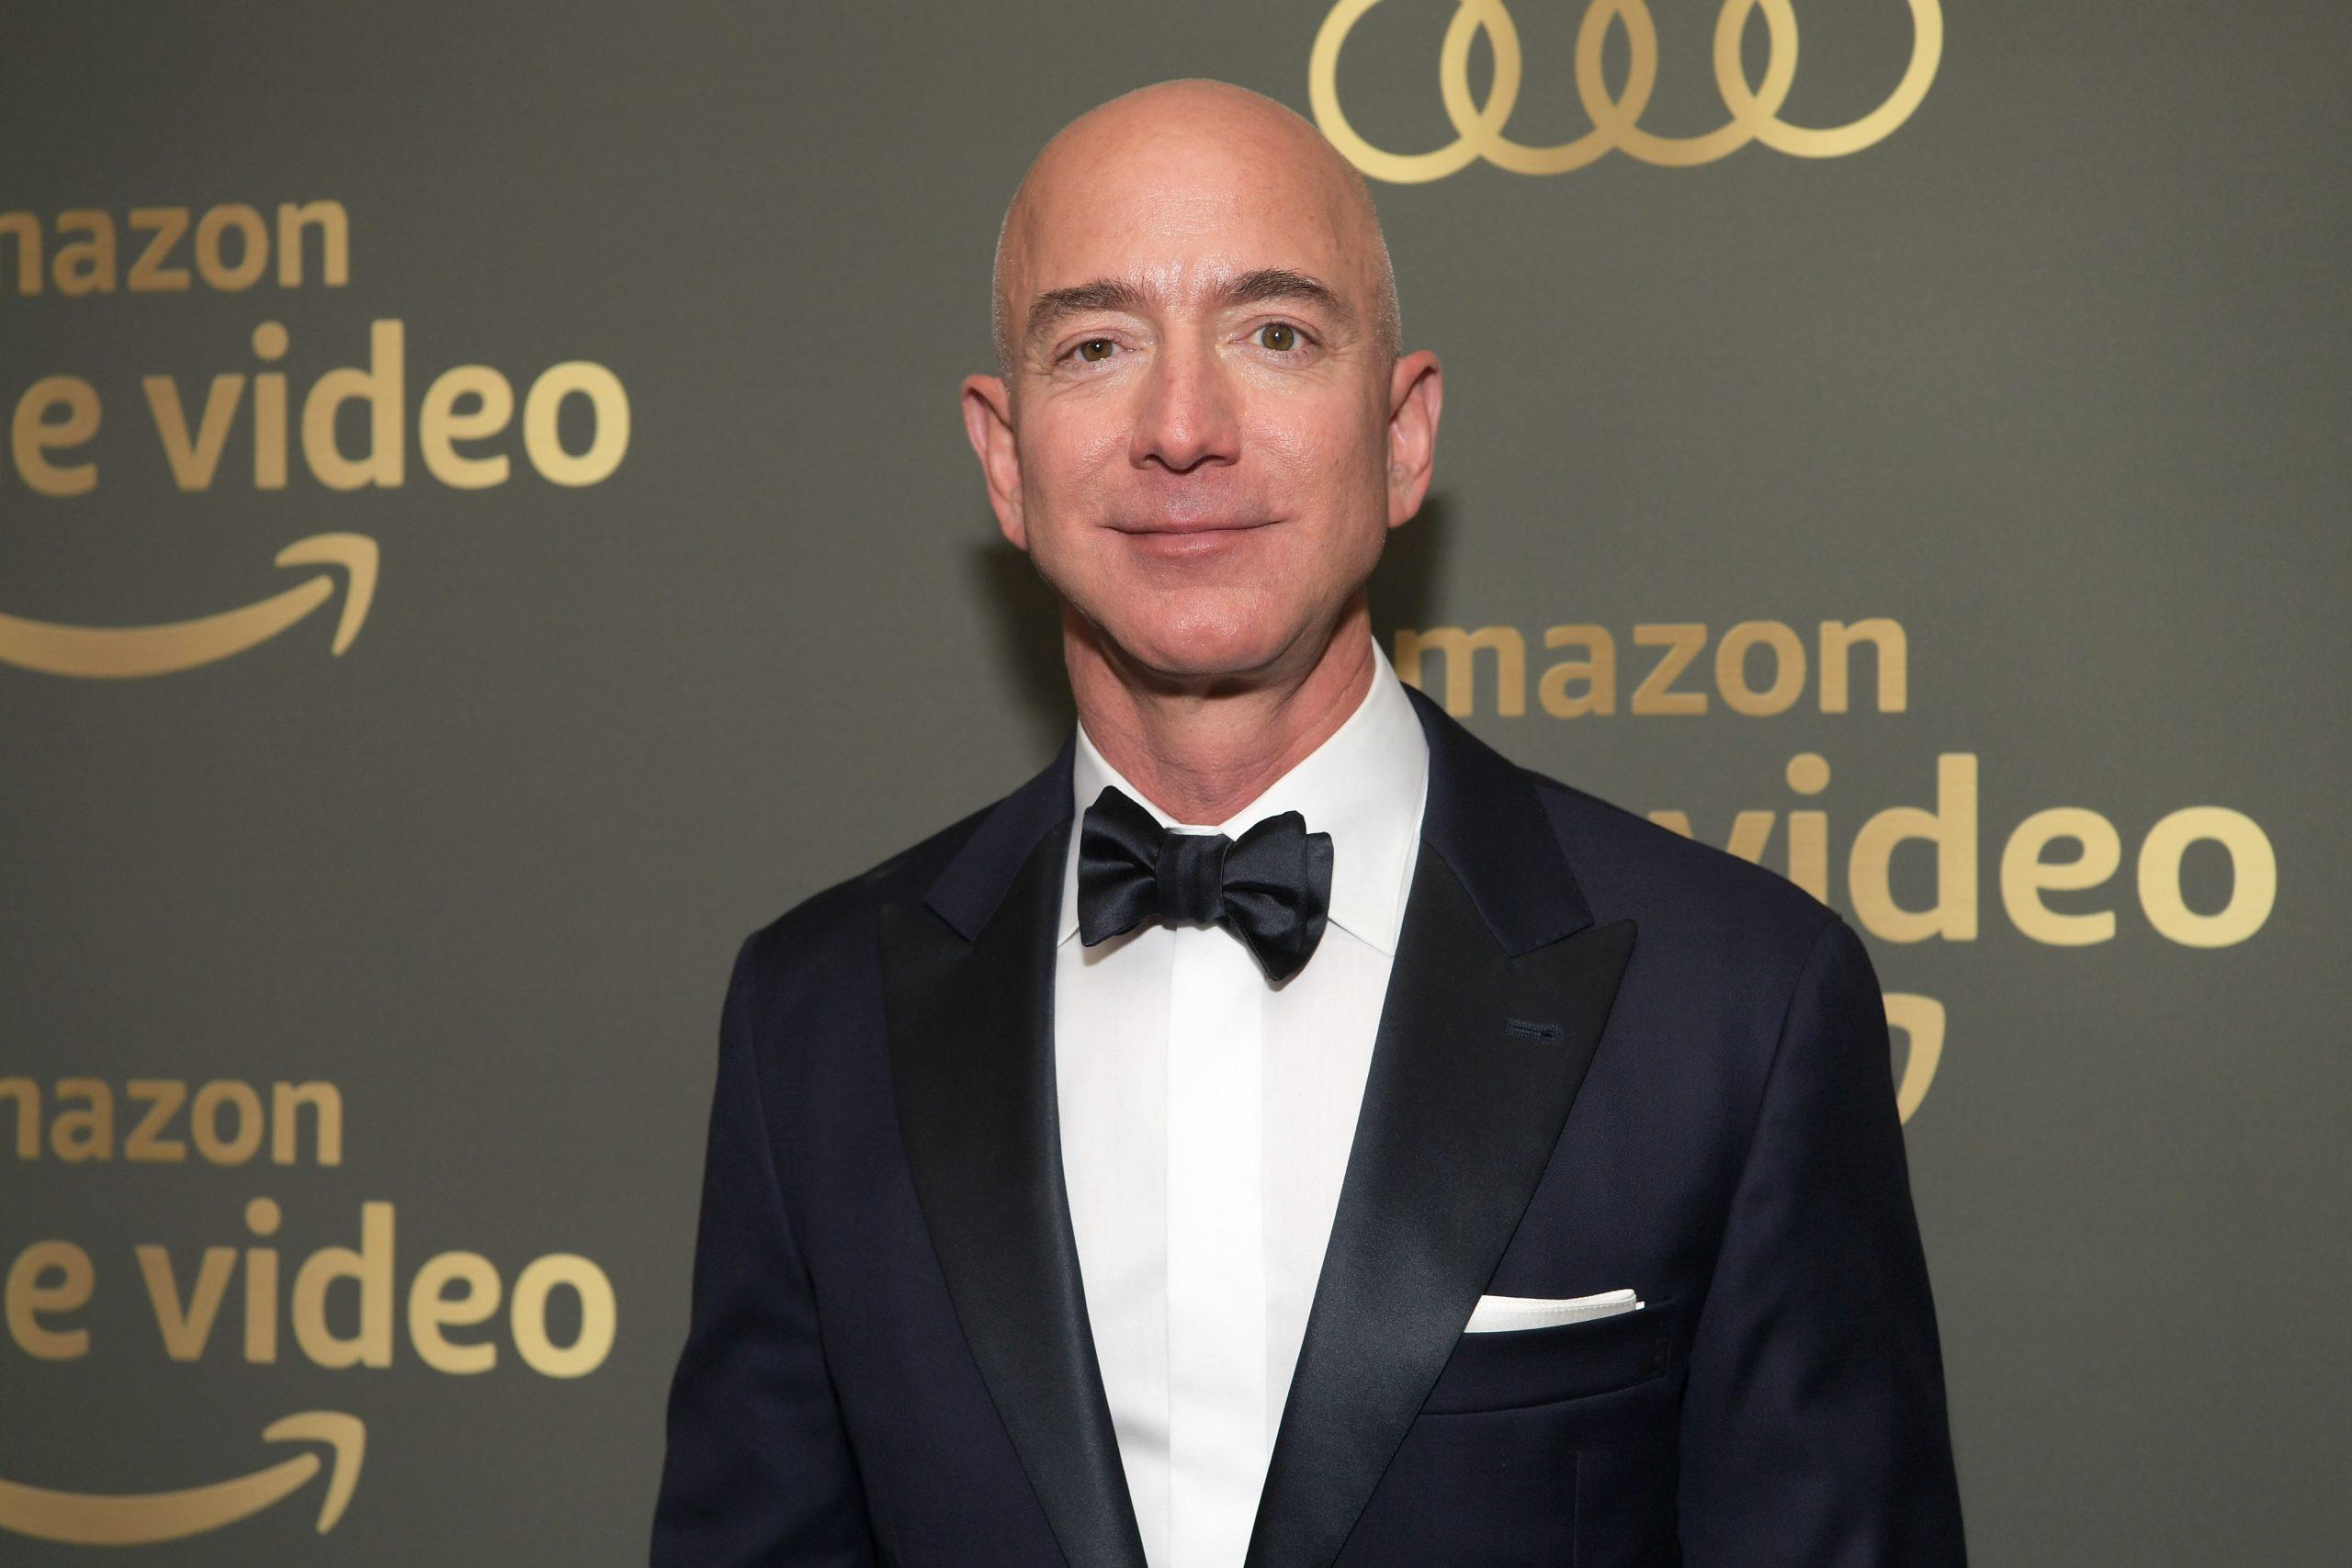 Jeff <b>Bezos</b>' wealth...